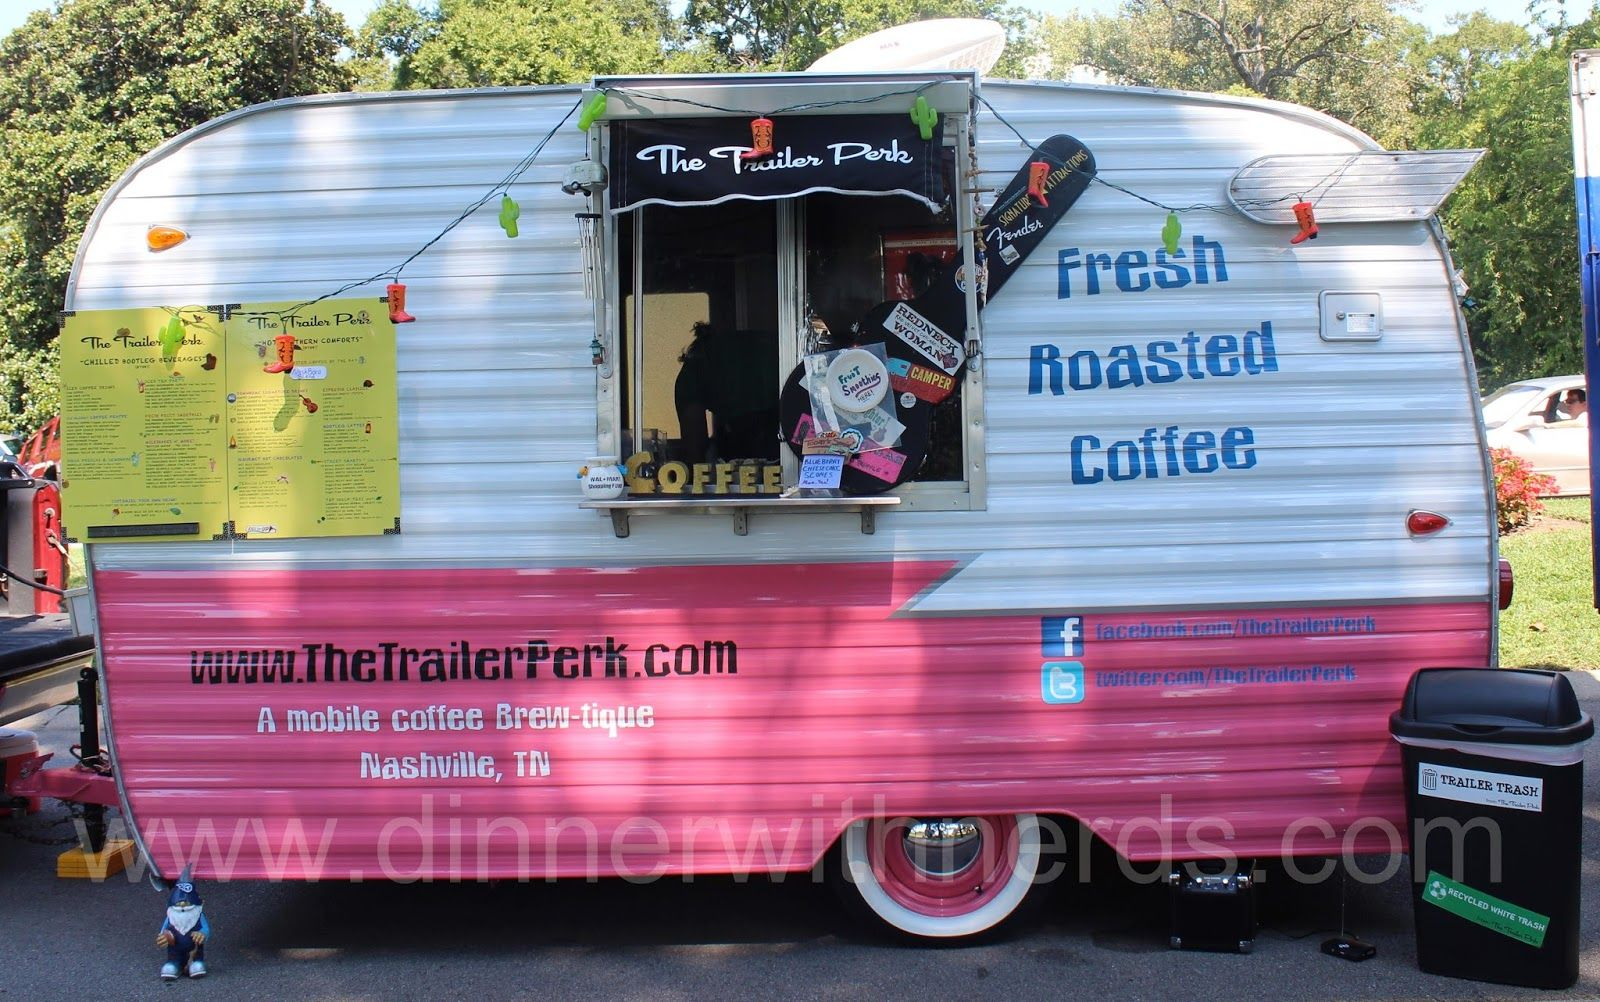 Trailer Perk Nashville Food Truck...How cute